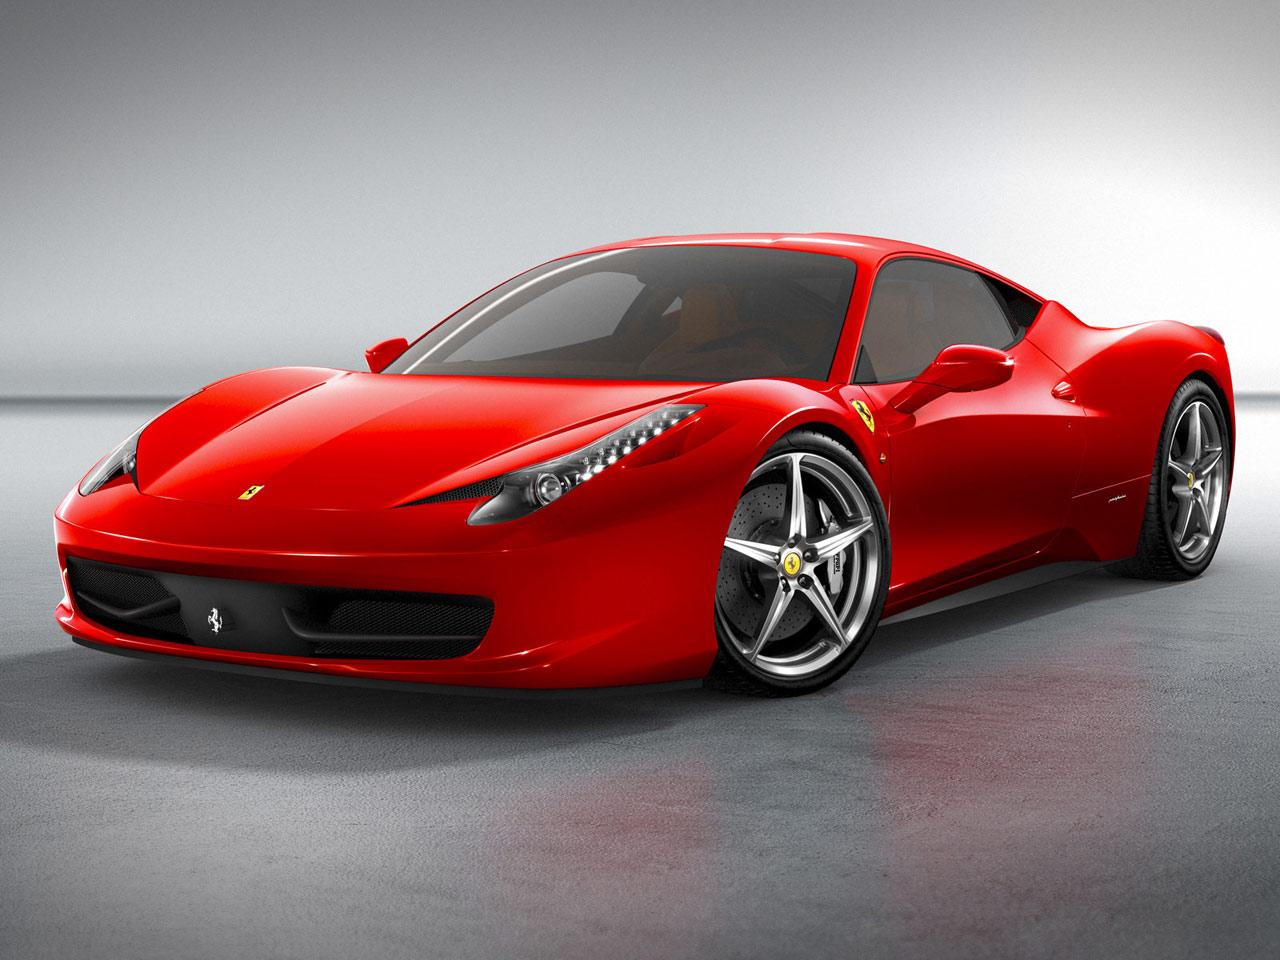 http://2.bp.blogspot.com/-R3T-CsLB2PE/UD1wfsMPX8I/AAAAAAAAB8c/aHiqiNdwxxc/s1600/Ferrari_458.jpg